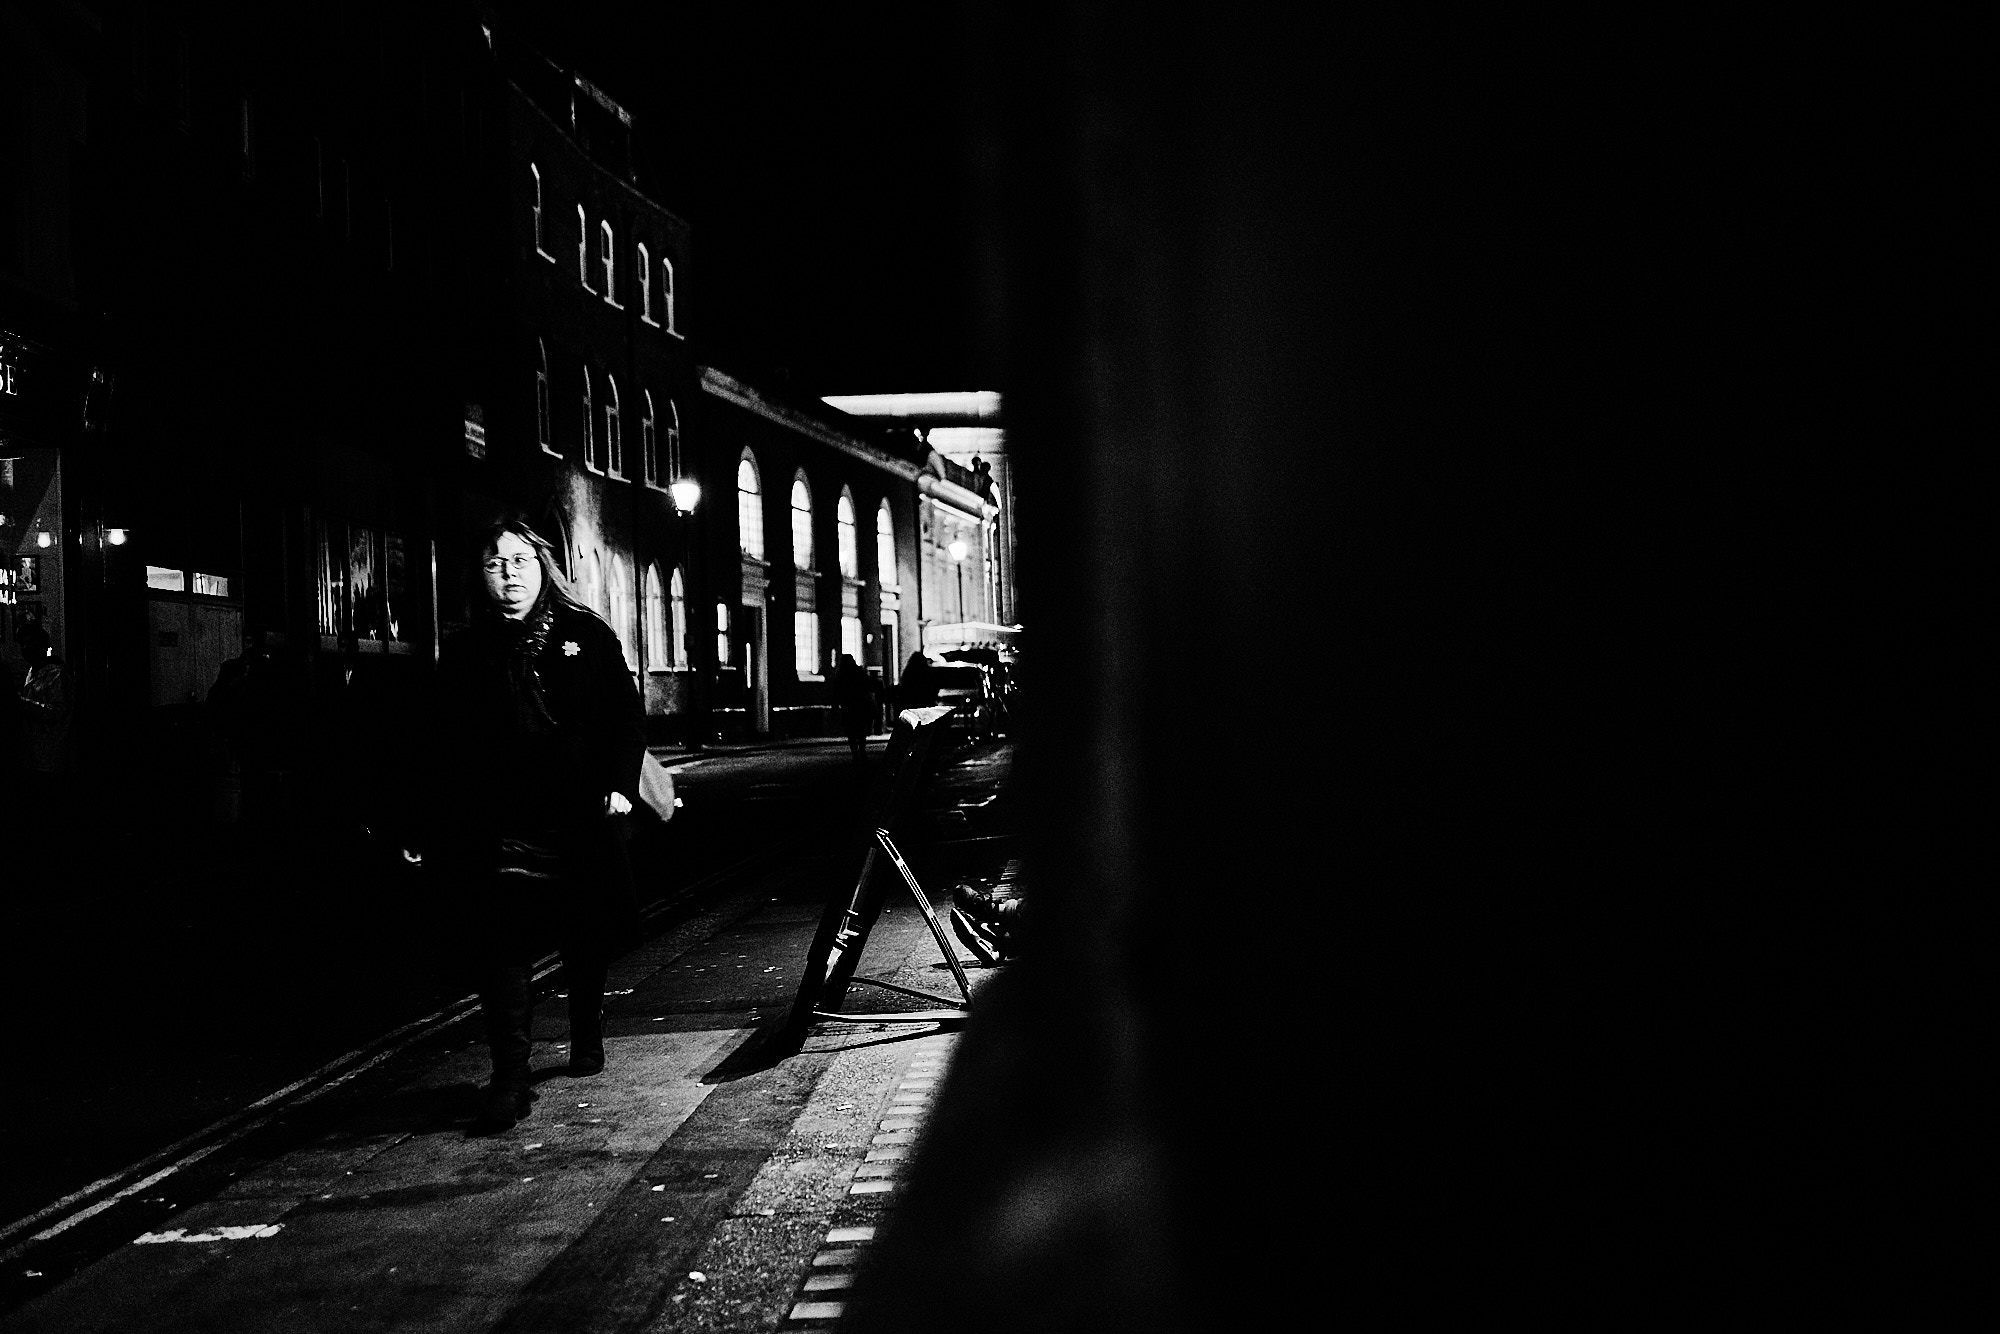 sony a7r street photography london